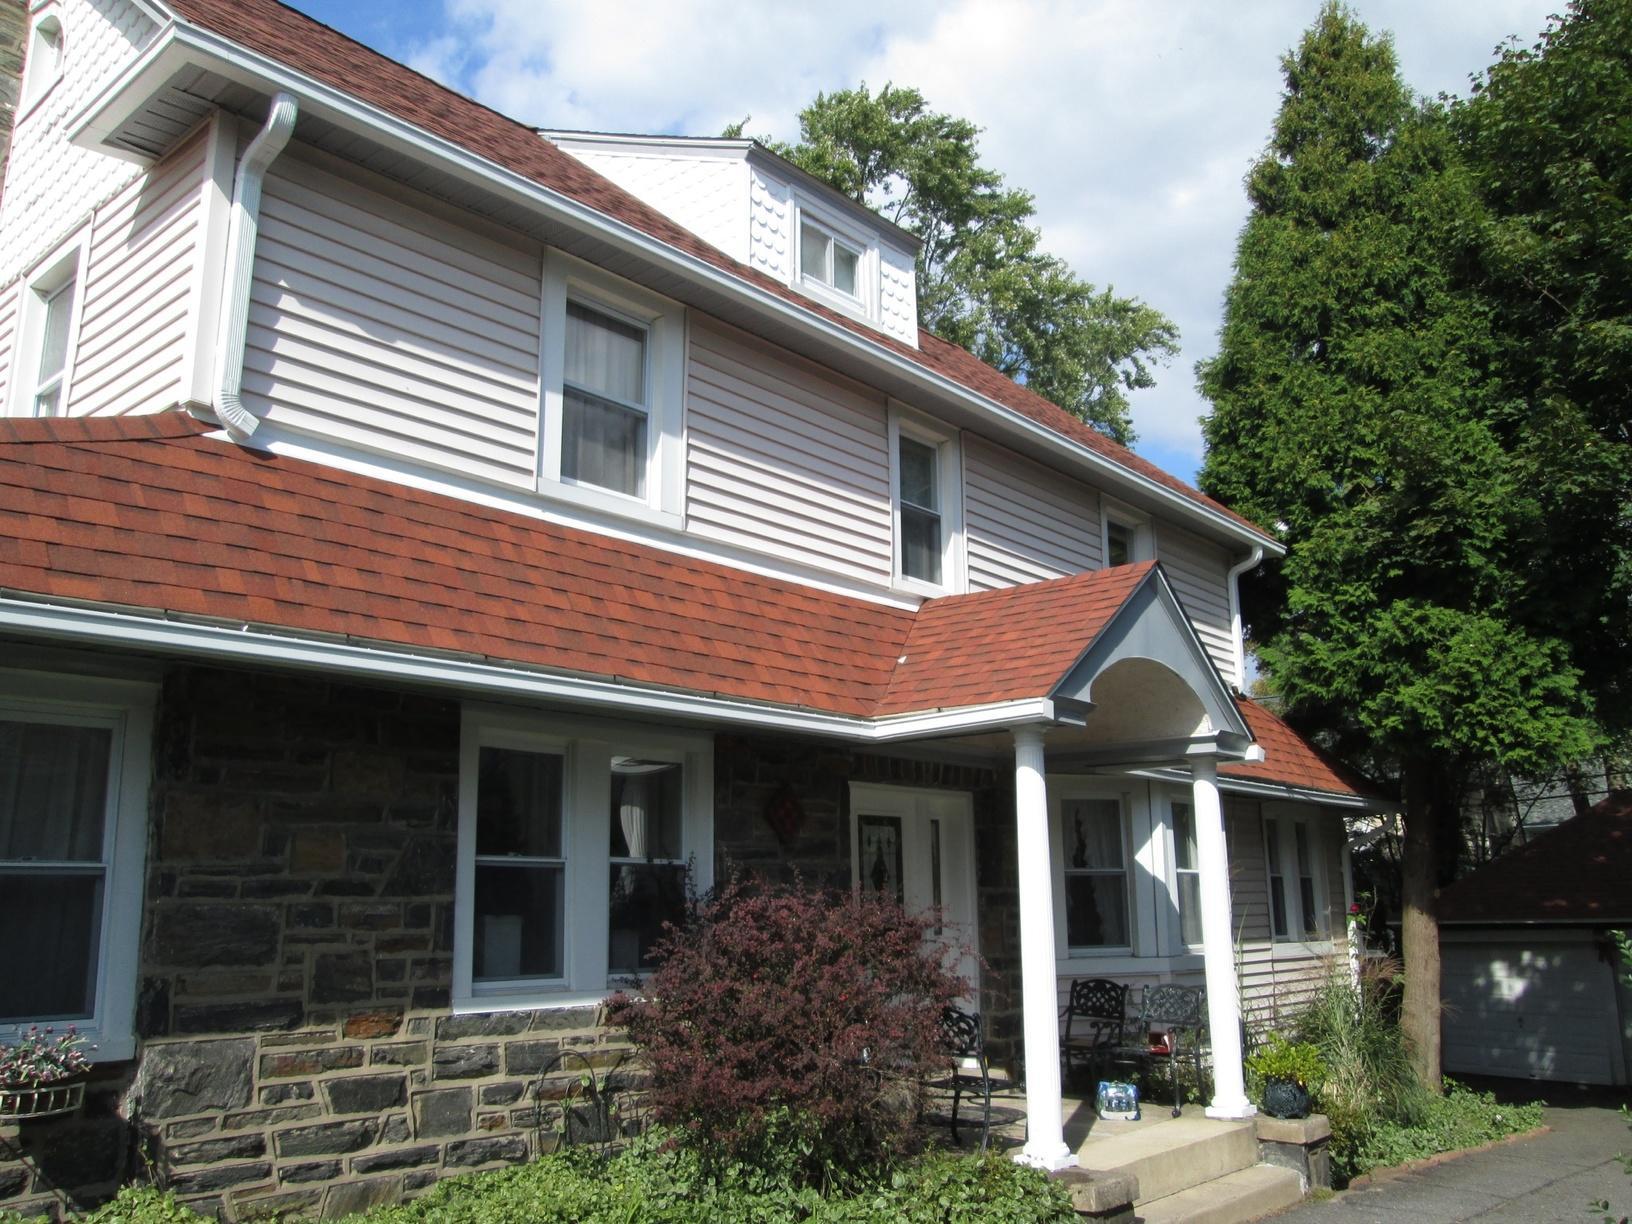 Mt. Laurel, NJ Roof Replacement